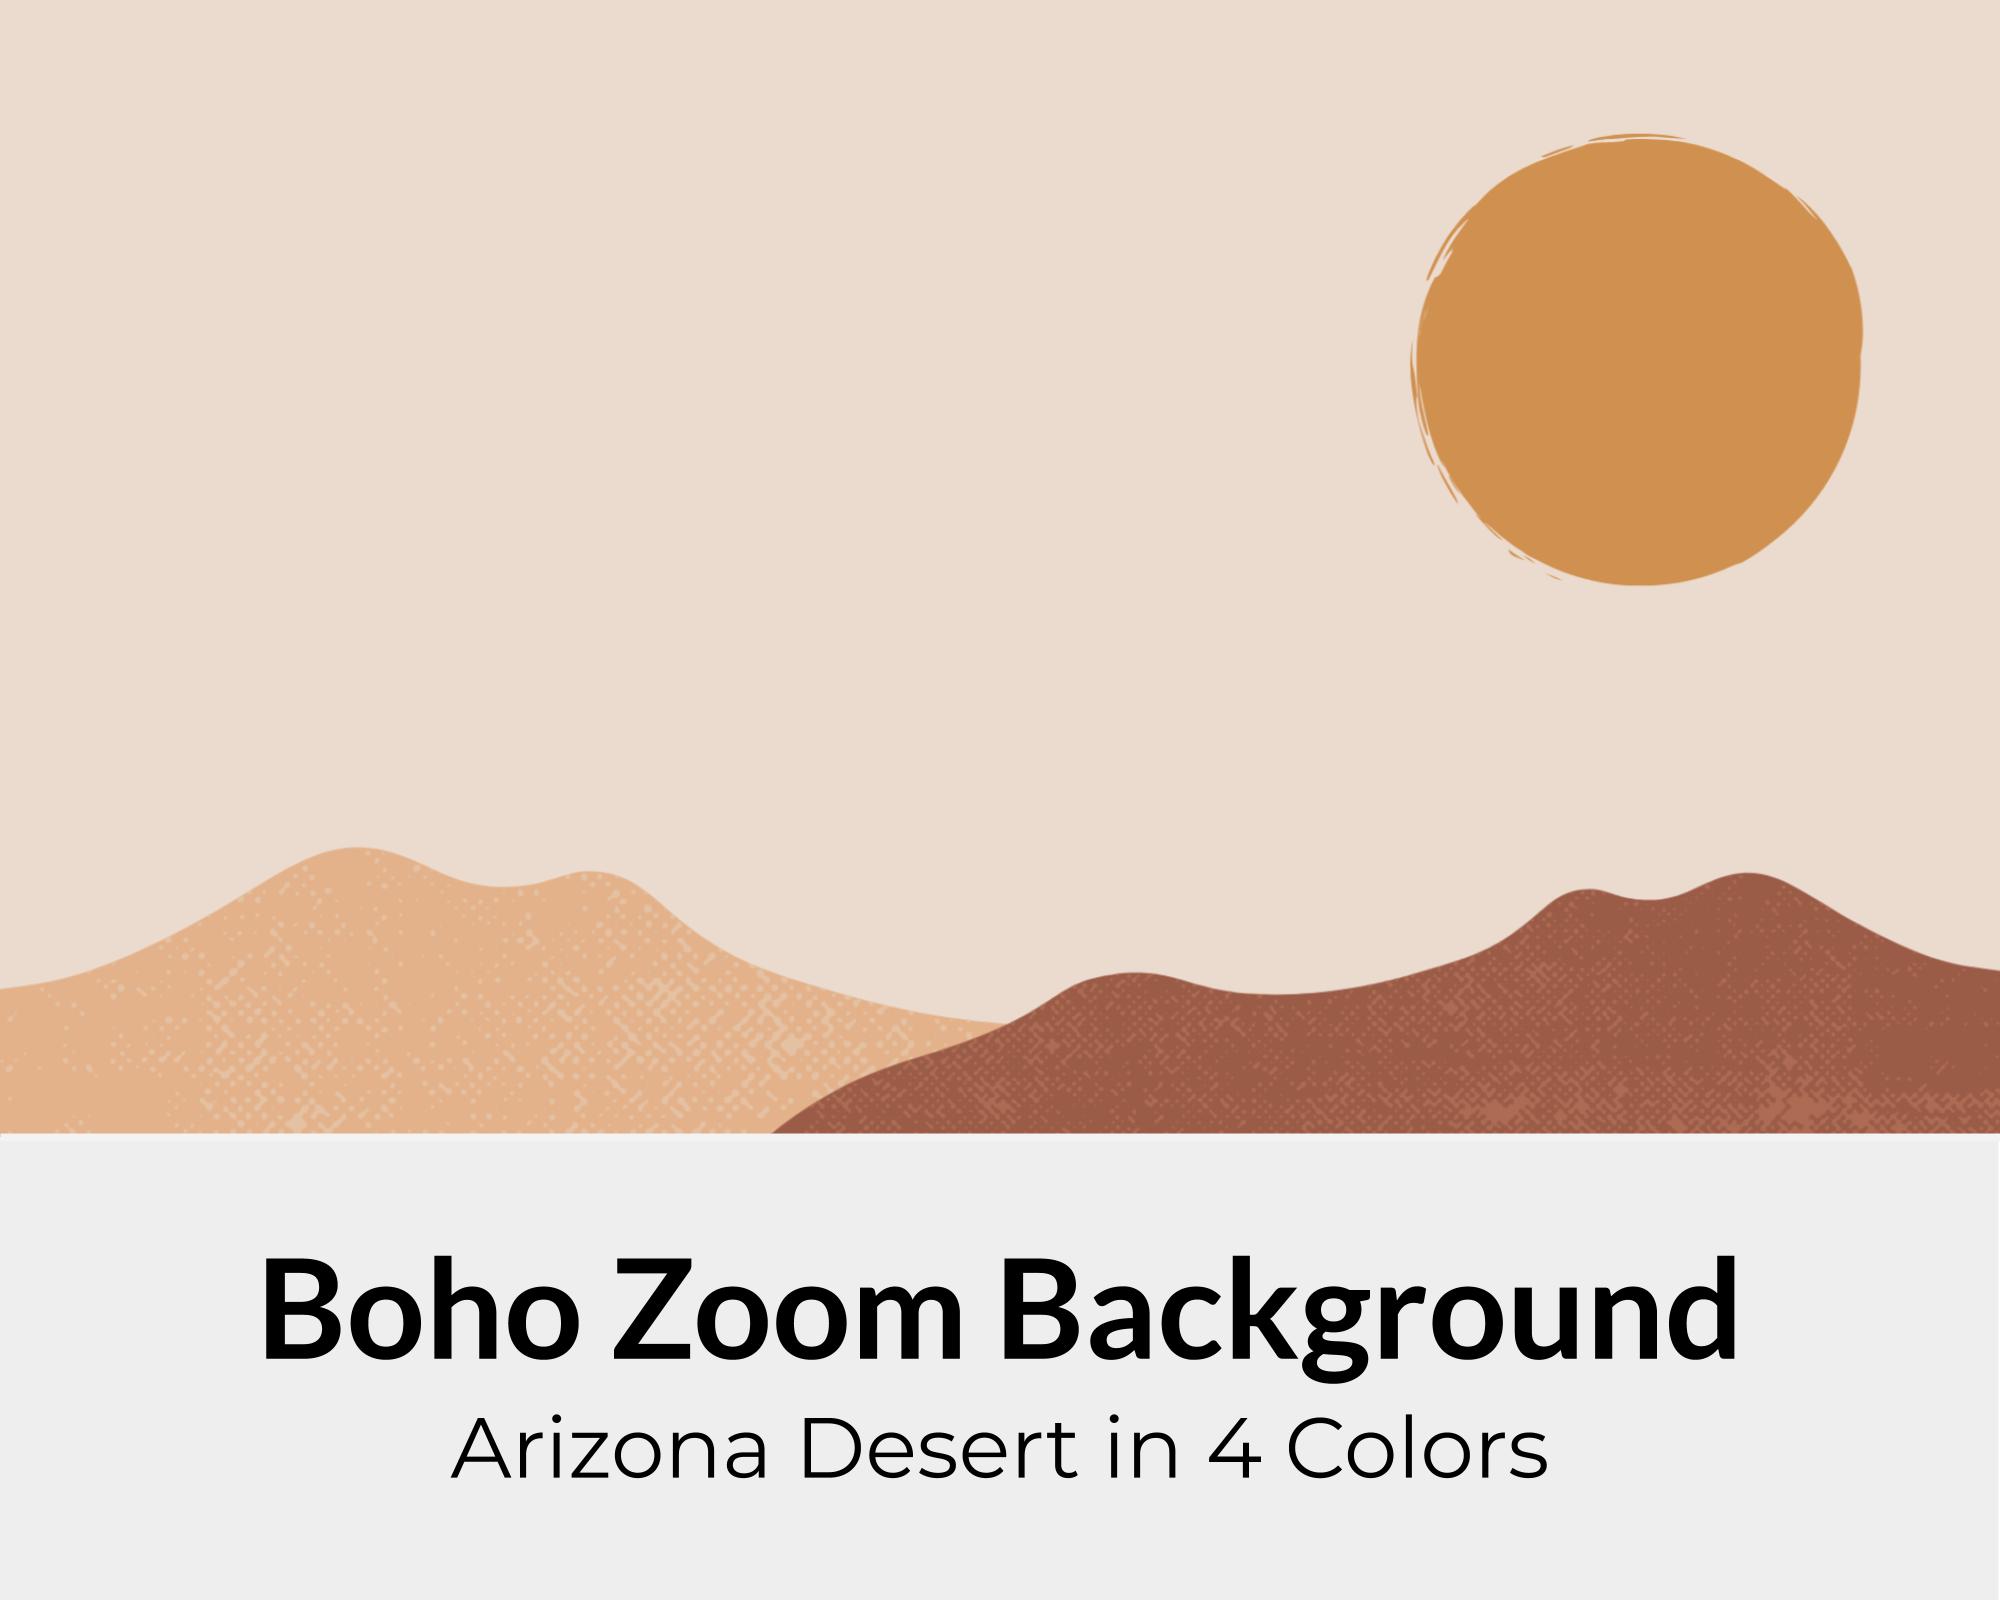 Boho Zoom Background Pack For Online Meetings Virtual Background Simple Zoom Background Background Animals For Kids Boho